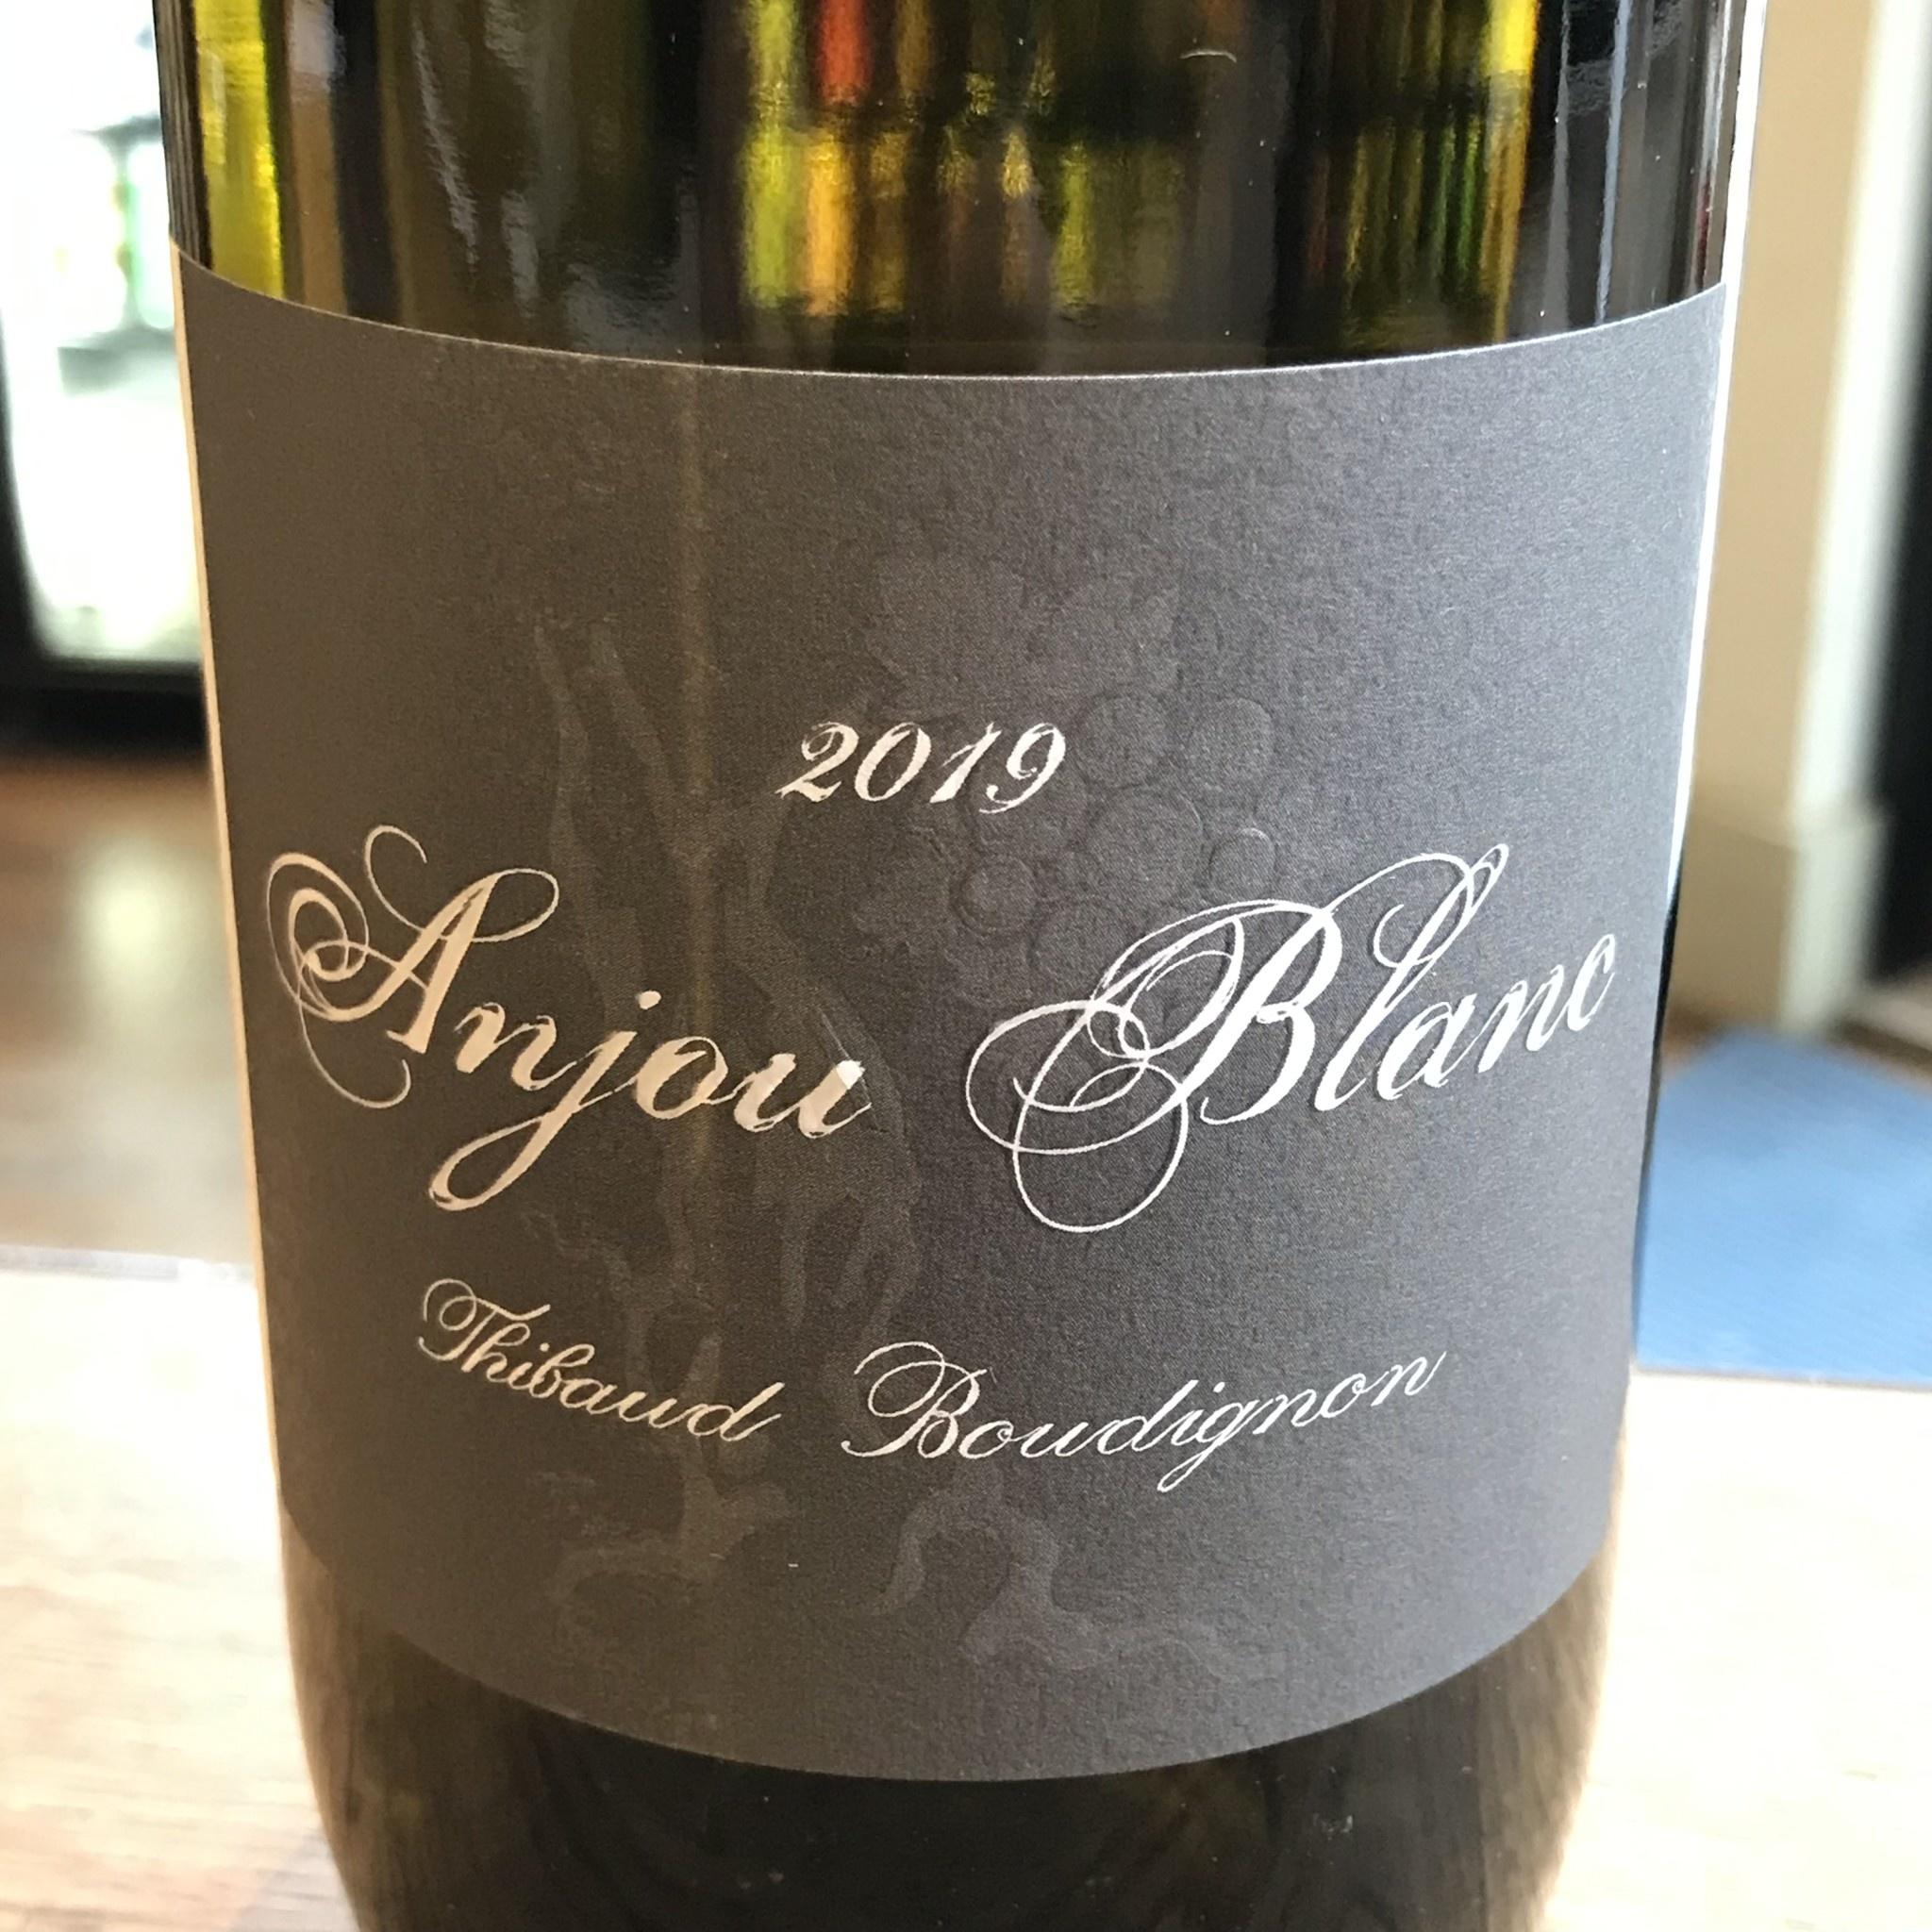 France 2019 Thibaud Boudignon Anjou Blanc